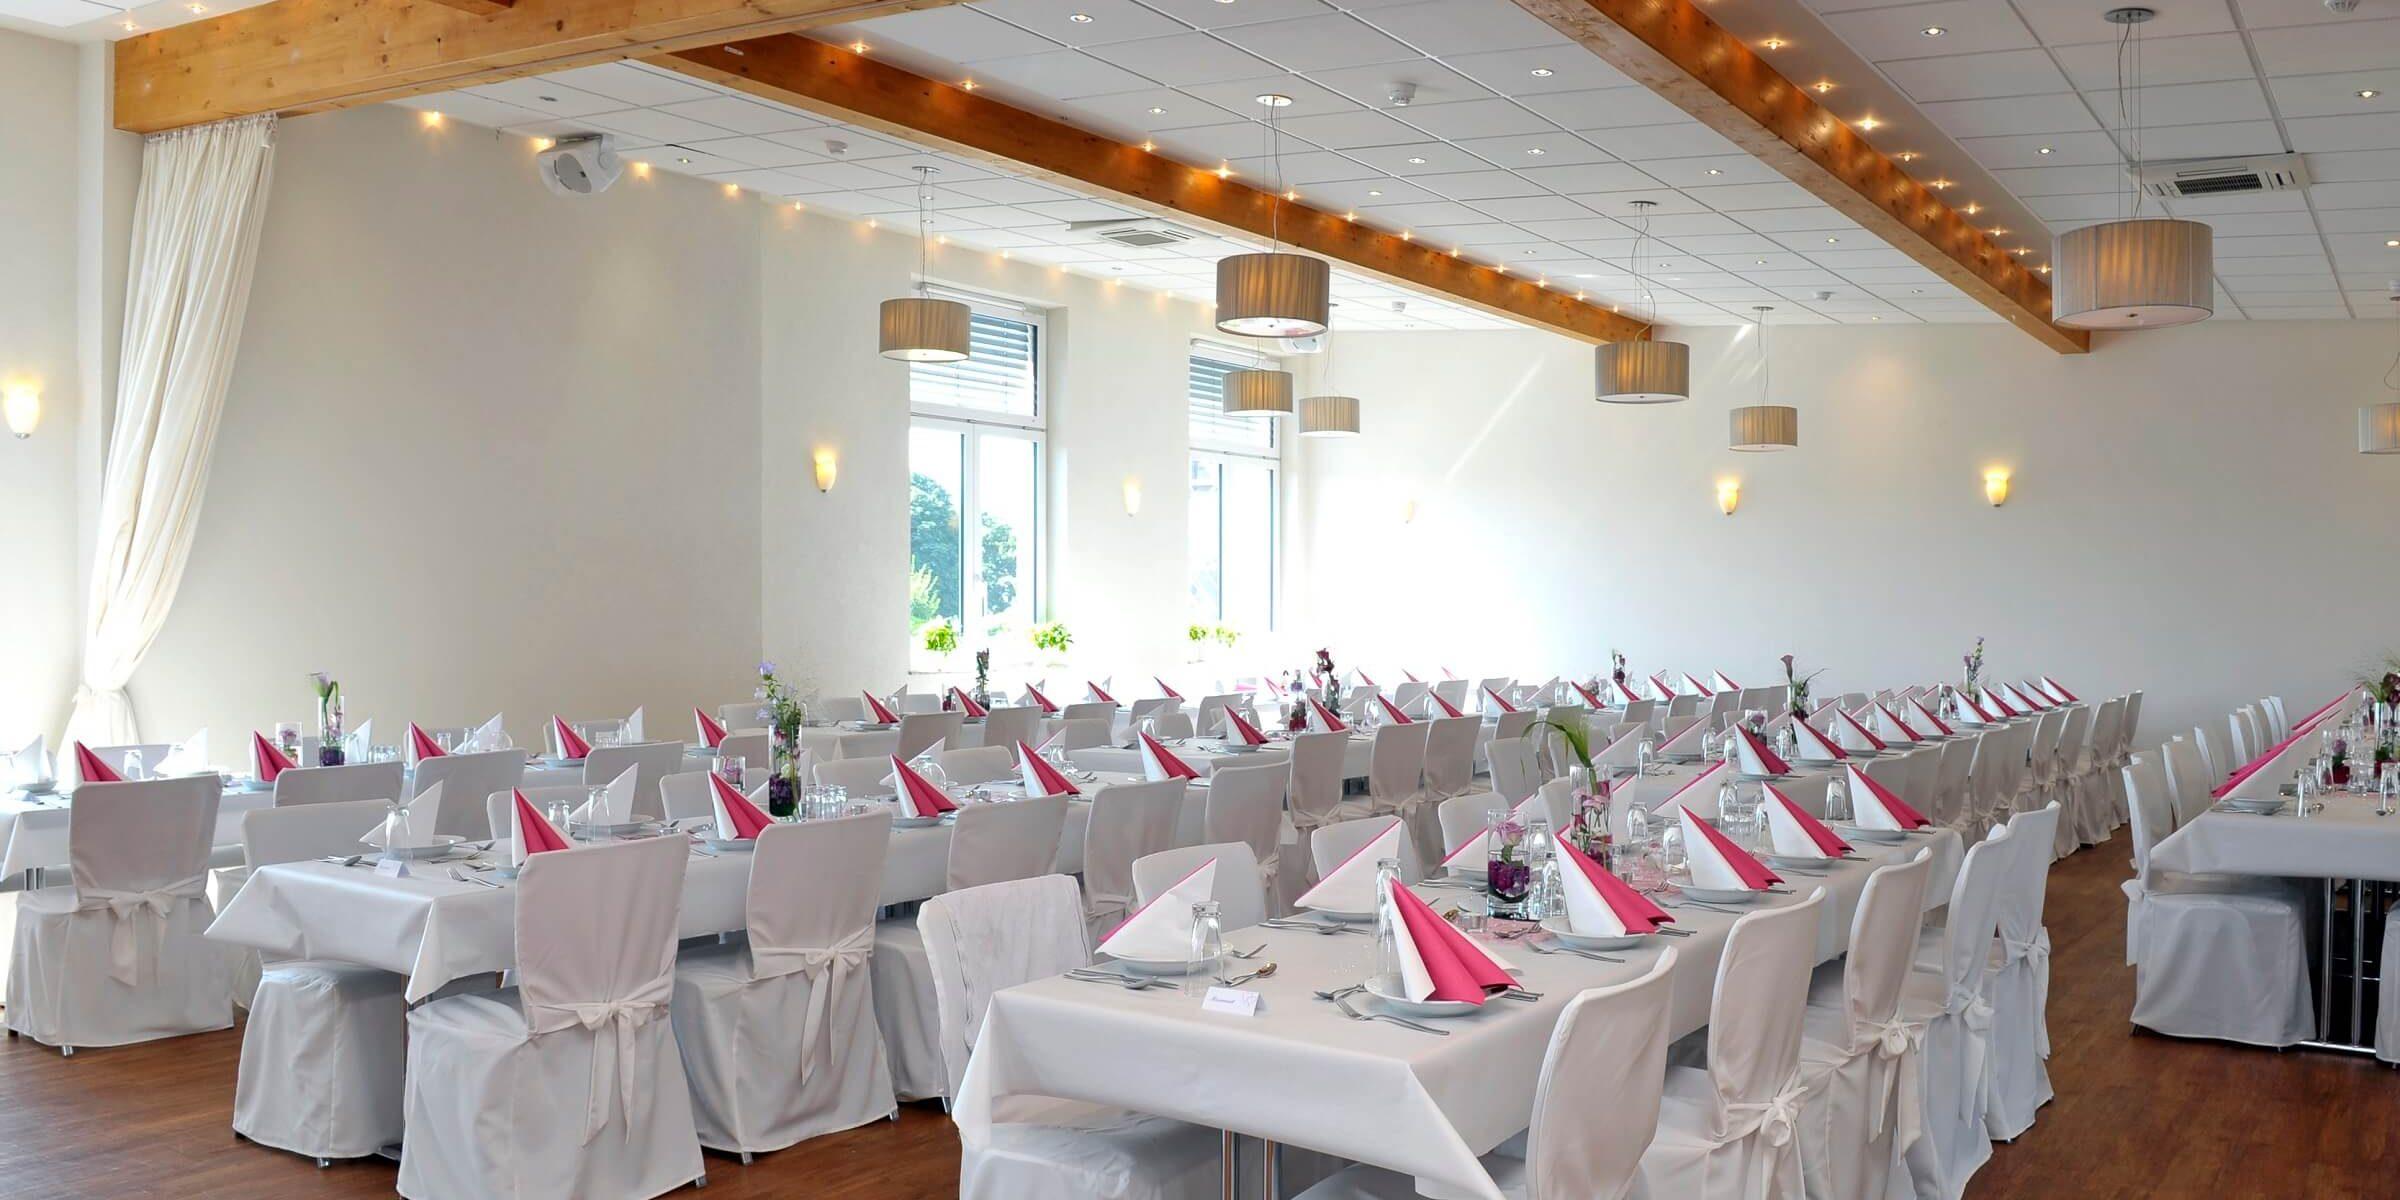 Feiern Hotel Viktorosa in Hofgeismar